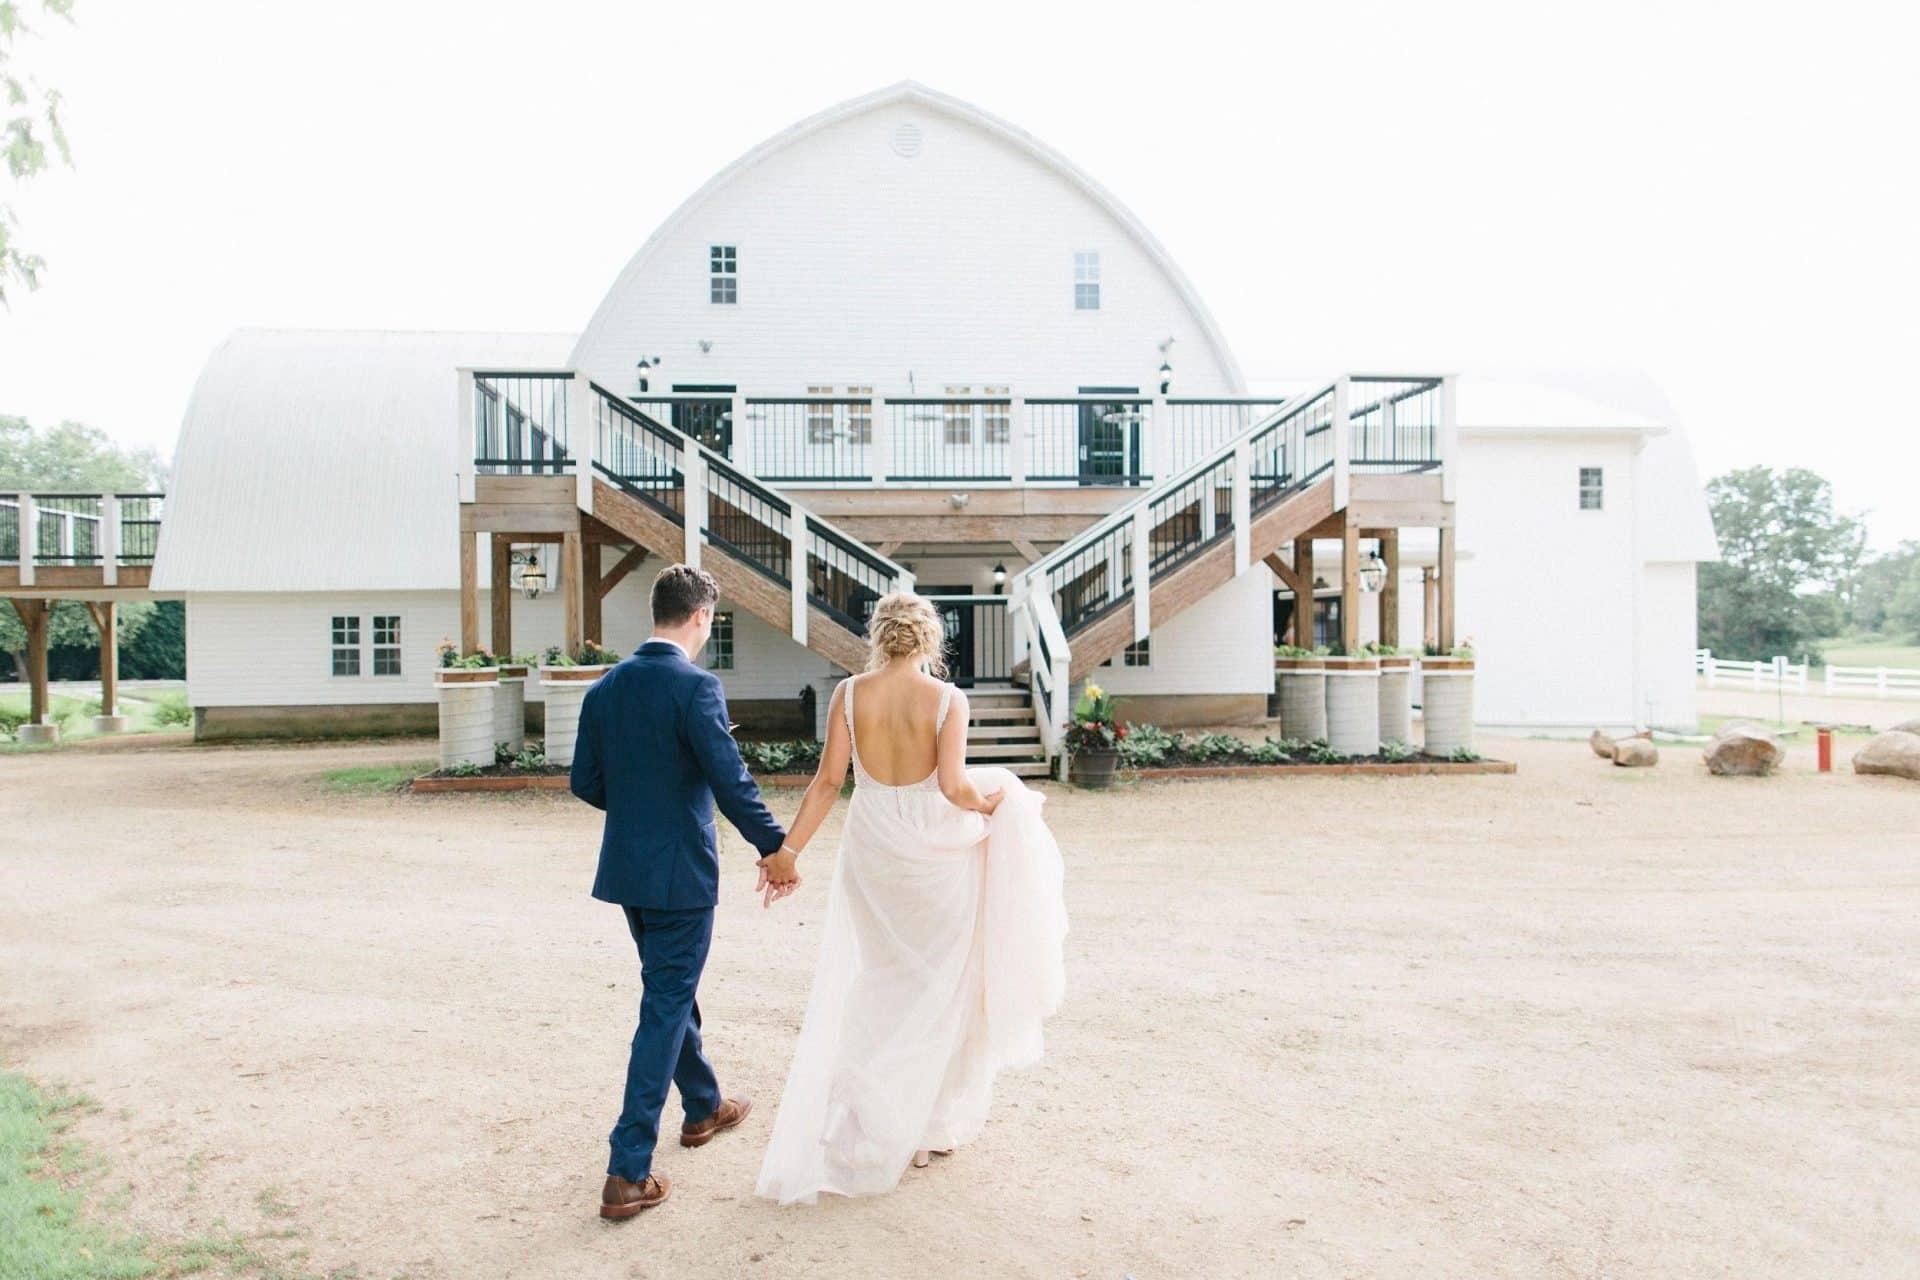 Finding a Wedding Venue